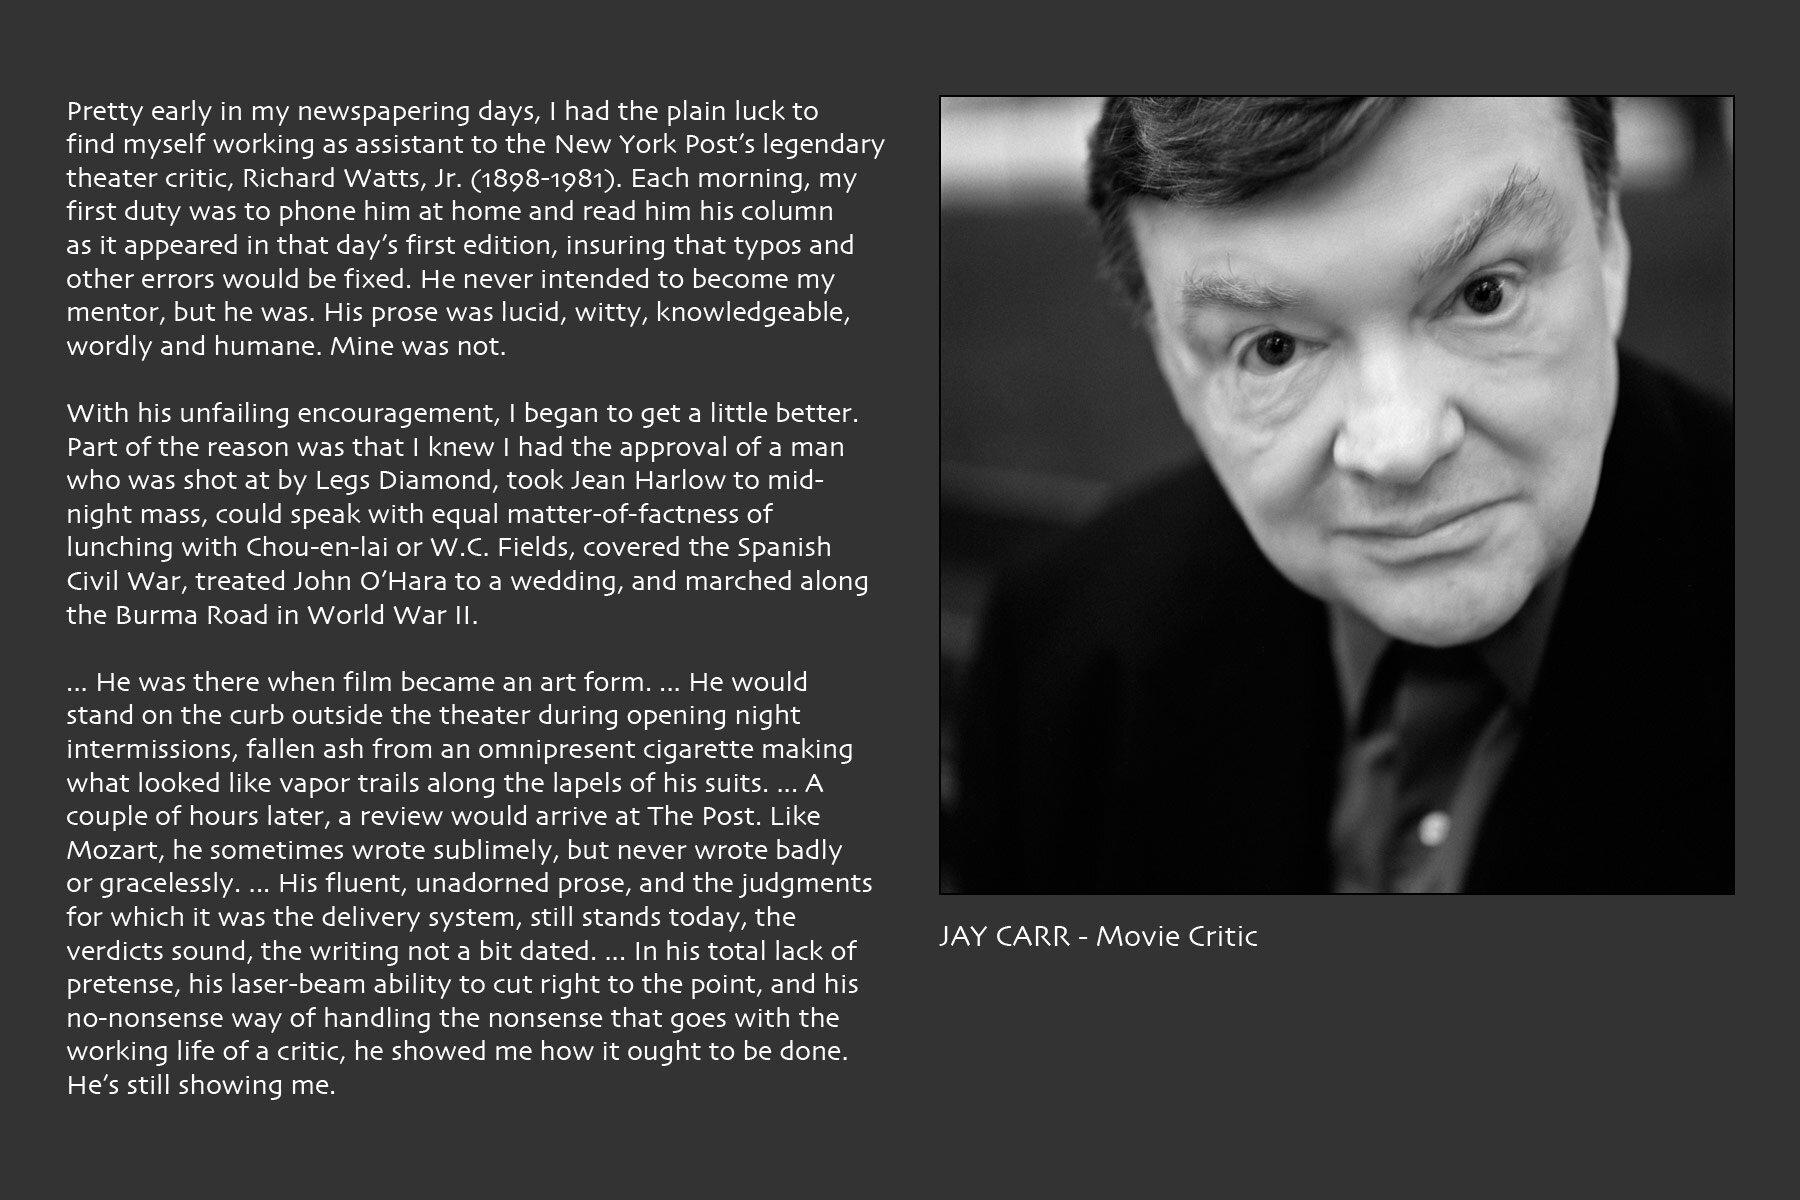 14-Mentors-Jay-Carr-tsar-fedorsky.jpg